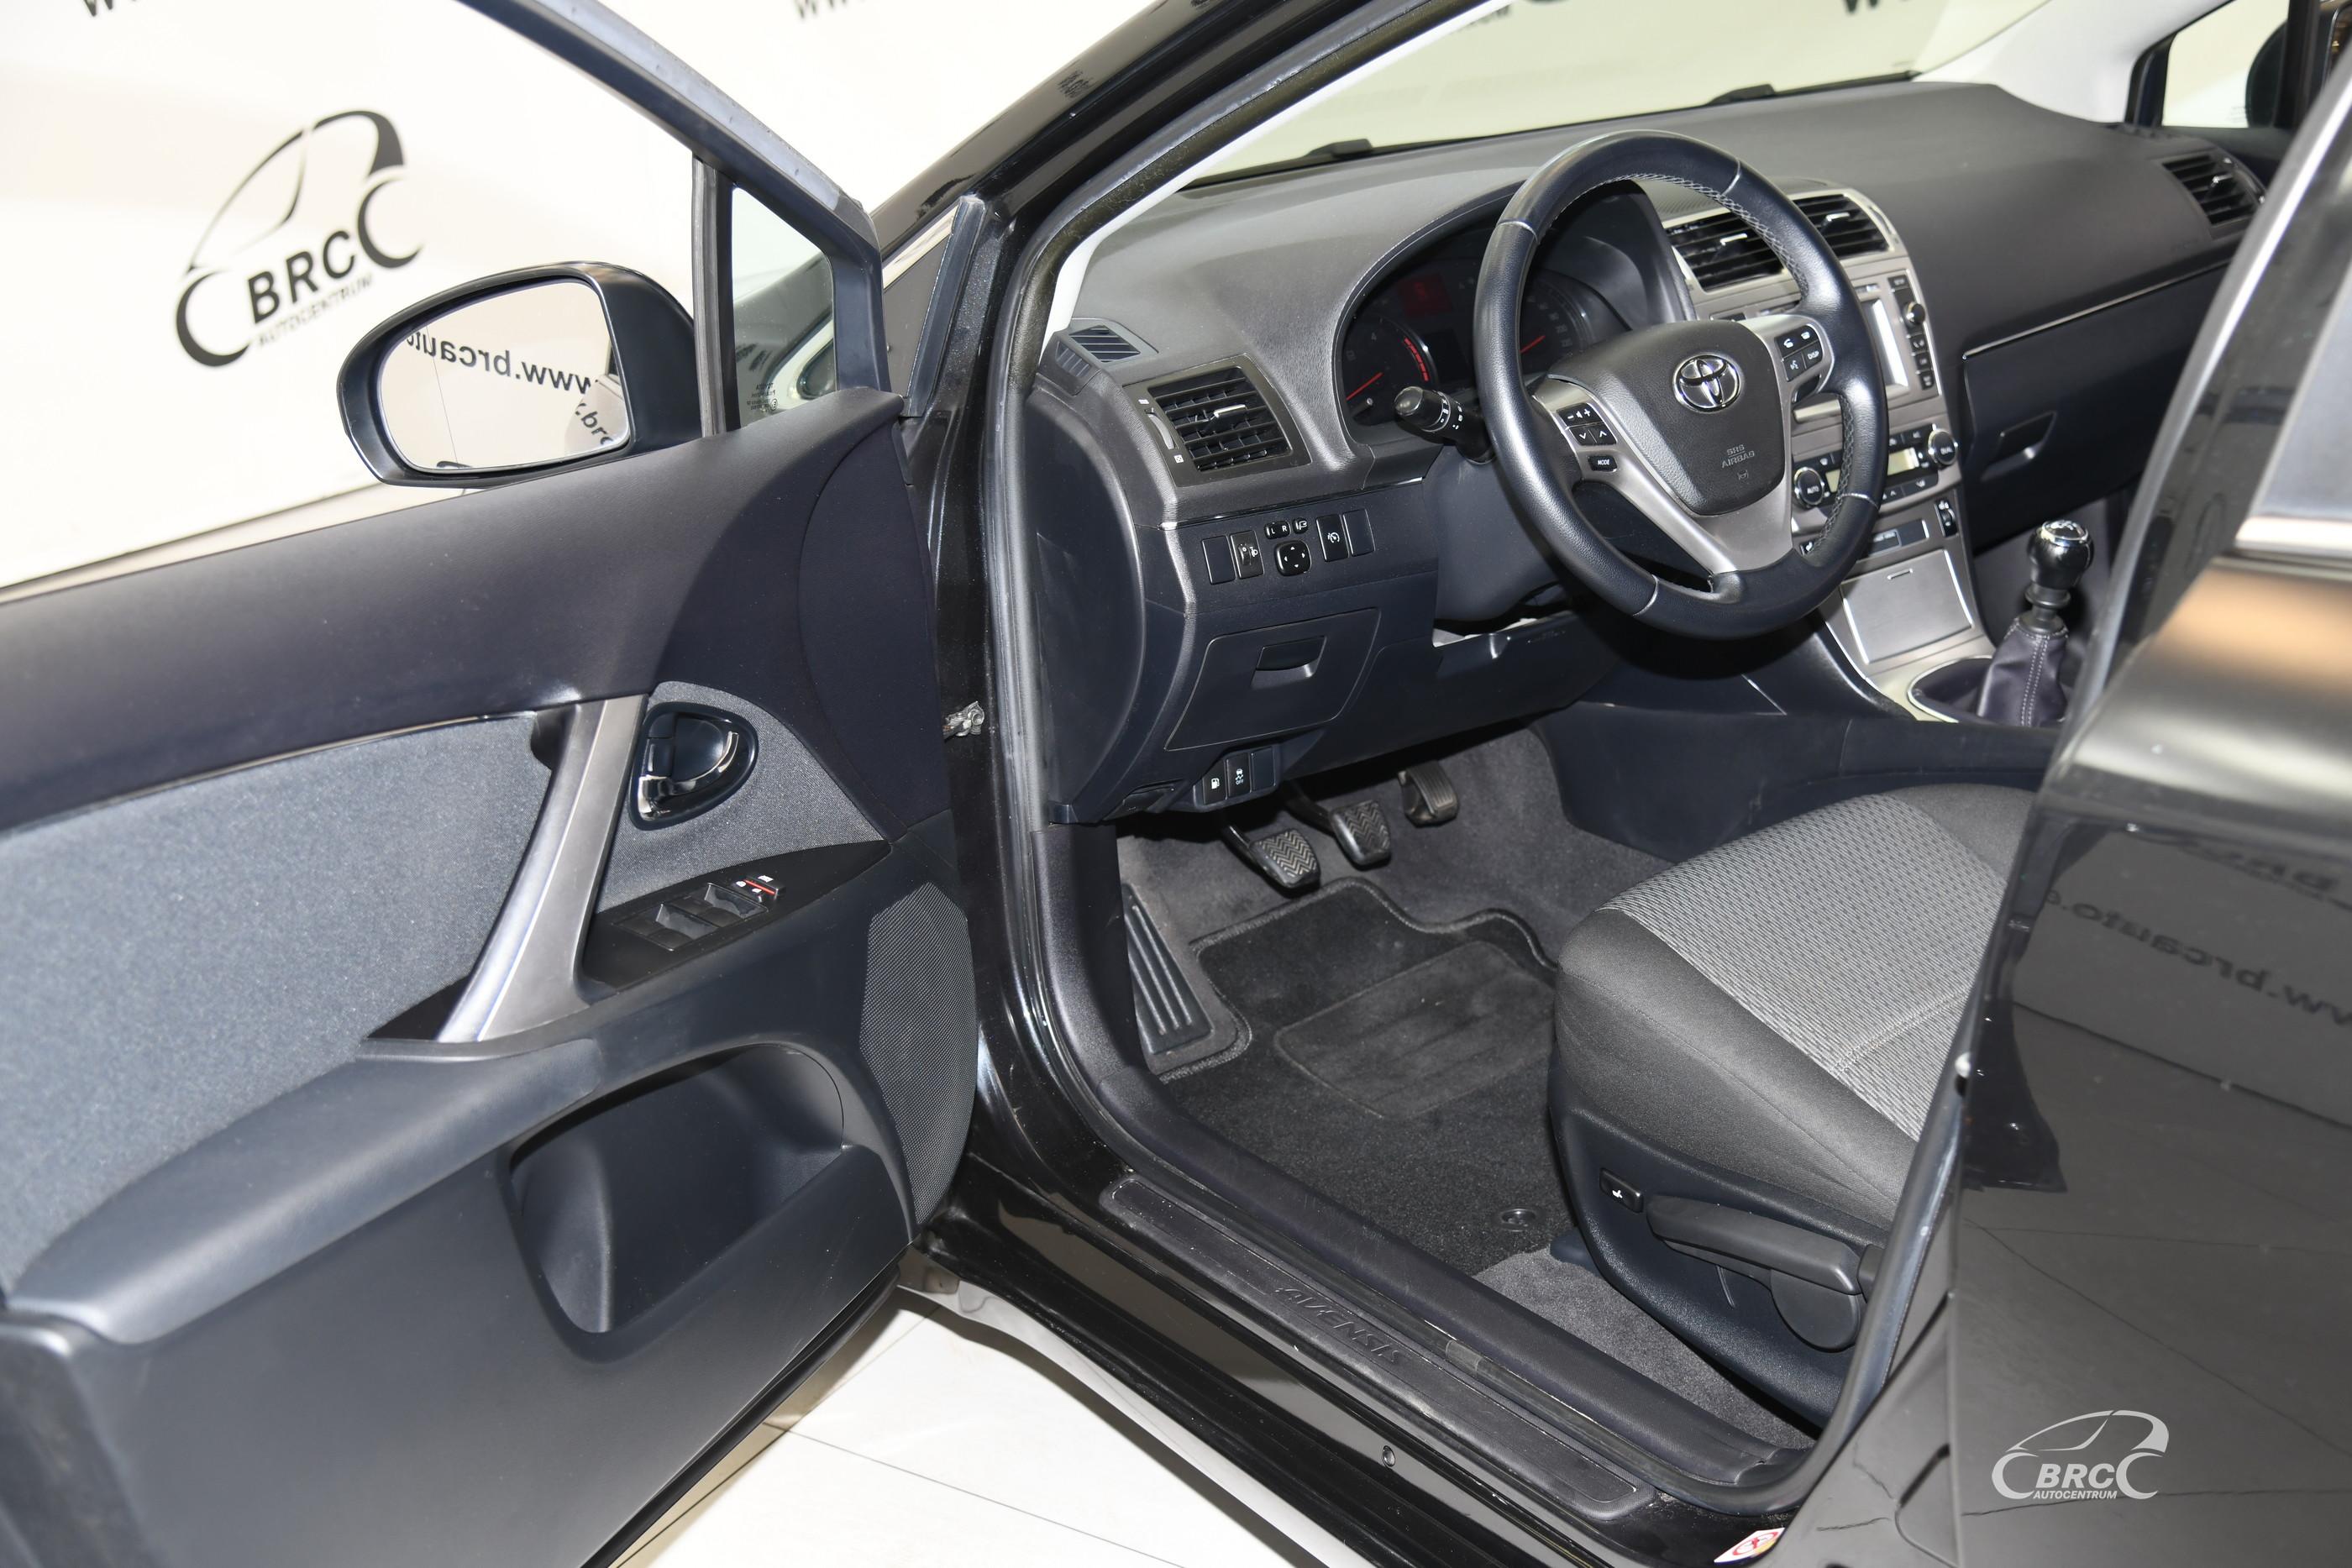 Toyota Avensis 2.2 D-4D Wagon